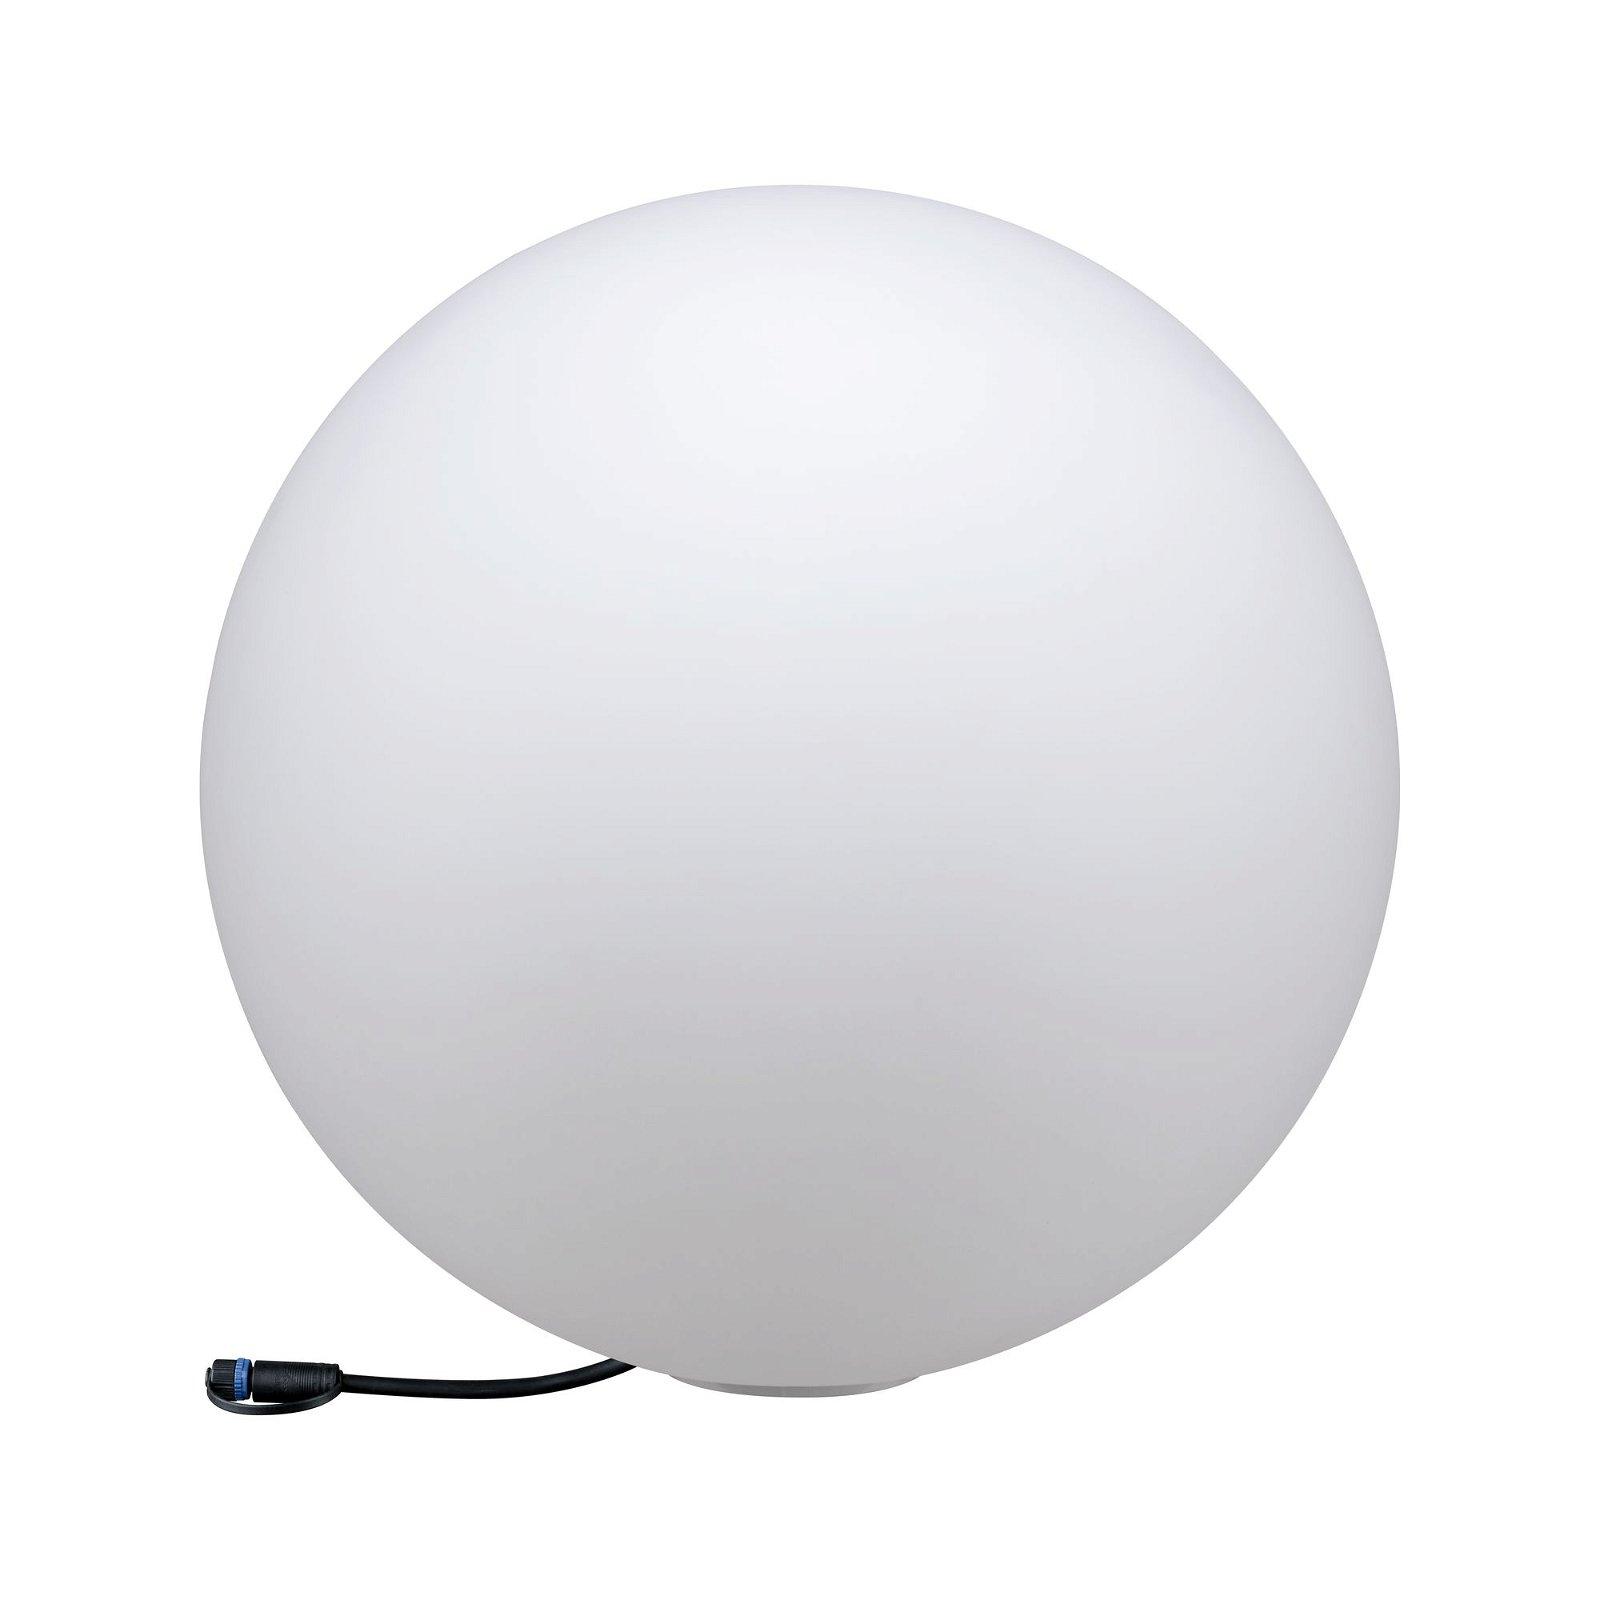 Plug & Shine Objet lumineux LED Globe 500mm IP67 3000K 6,5W Blanc